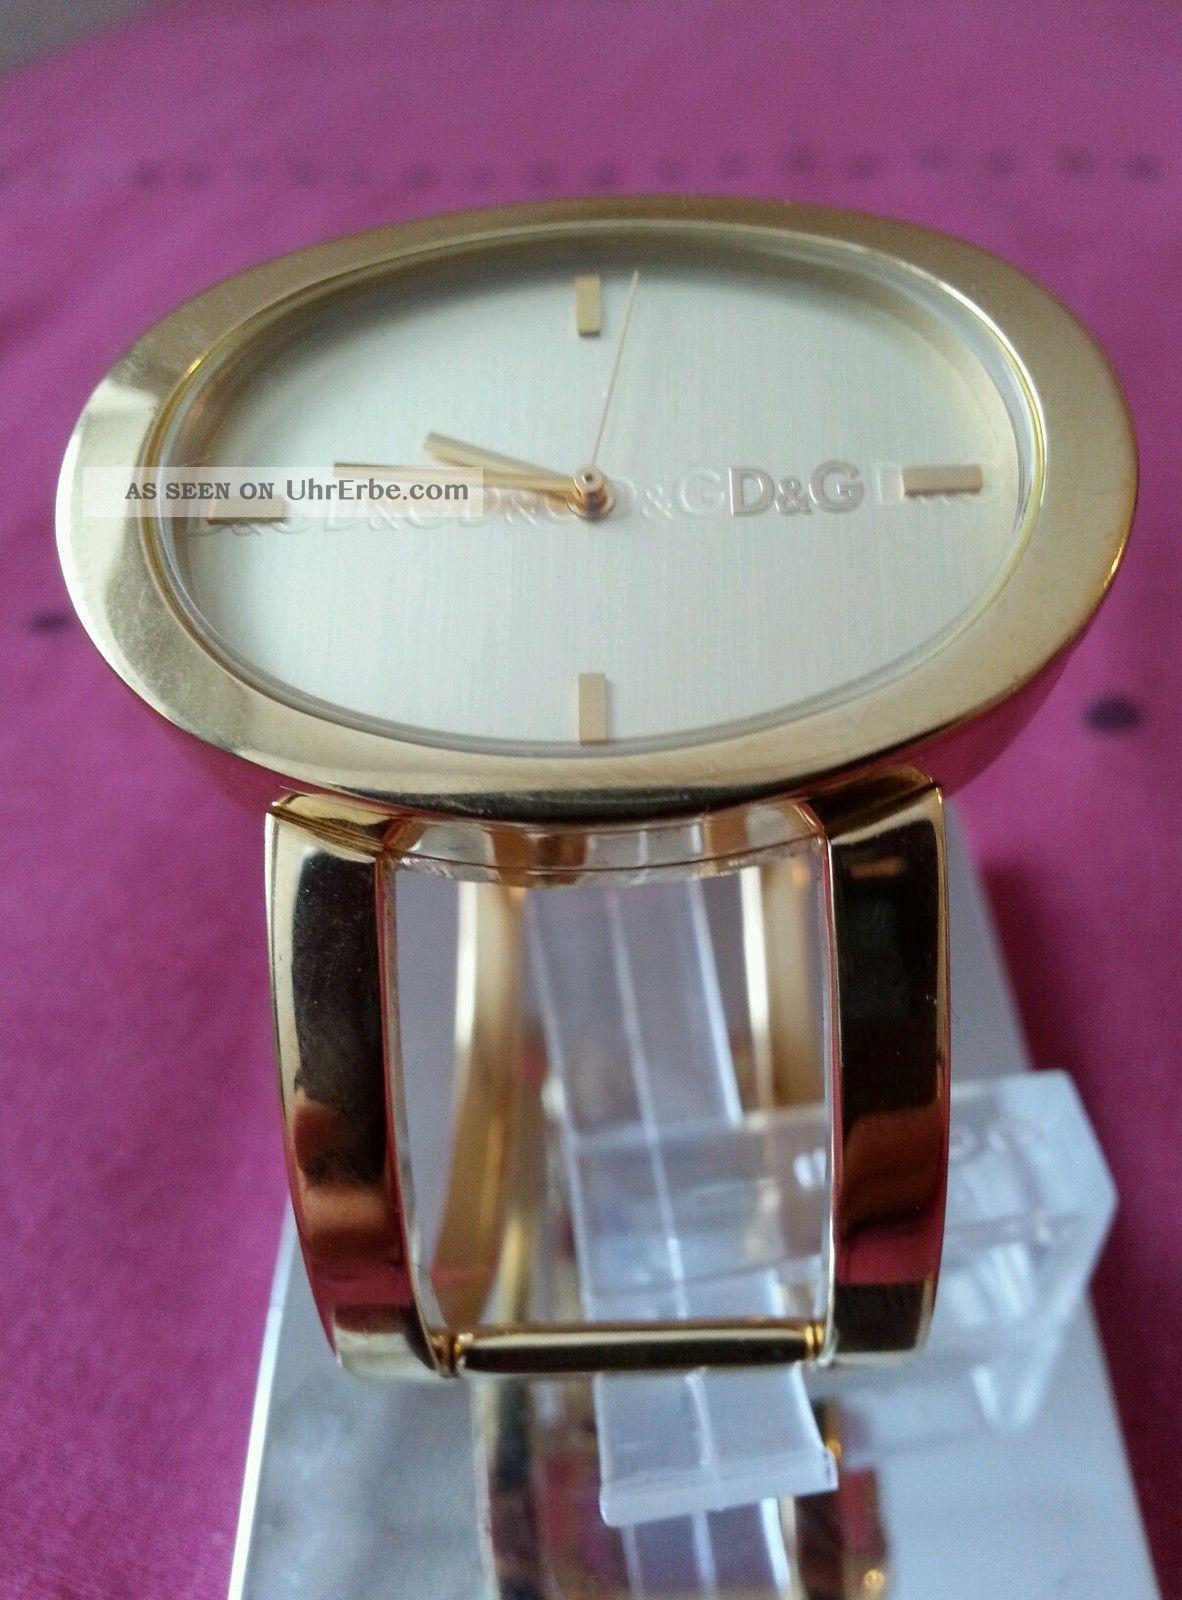 D&g Schöne Damen Uhr Armbanduhren Bild